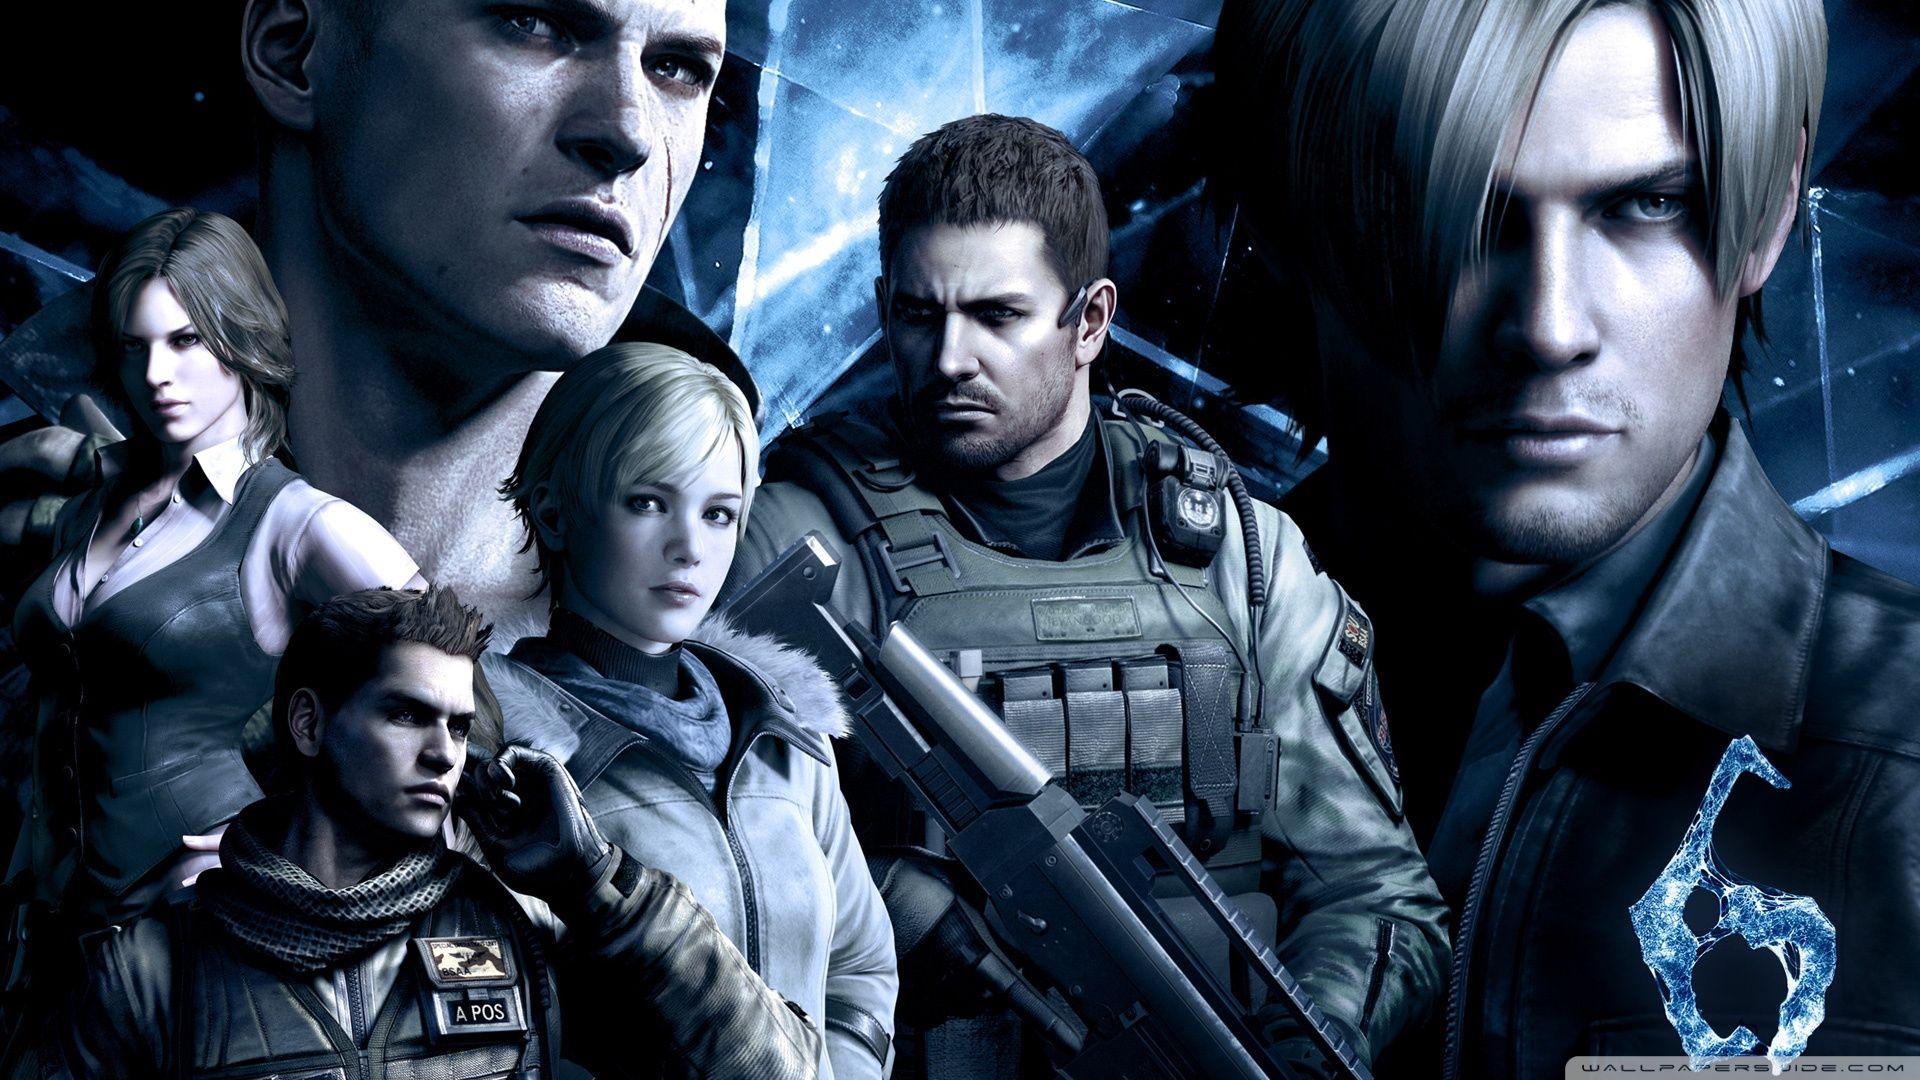 Hd wallpaper resident evil - Resident Evil 6 Characters Hd Desktop Wallpaper High Definition